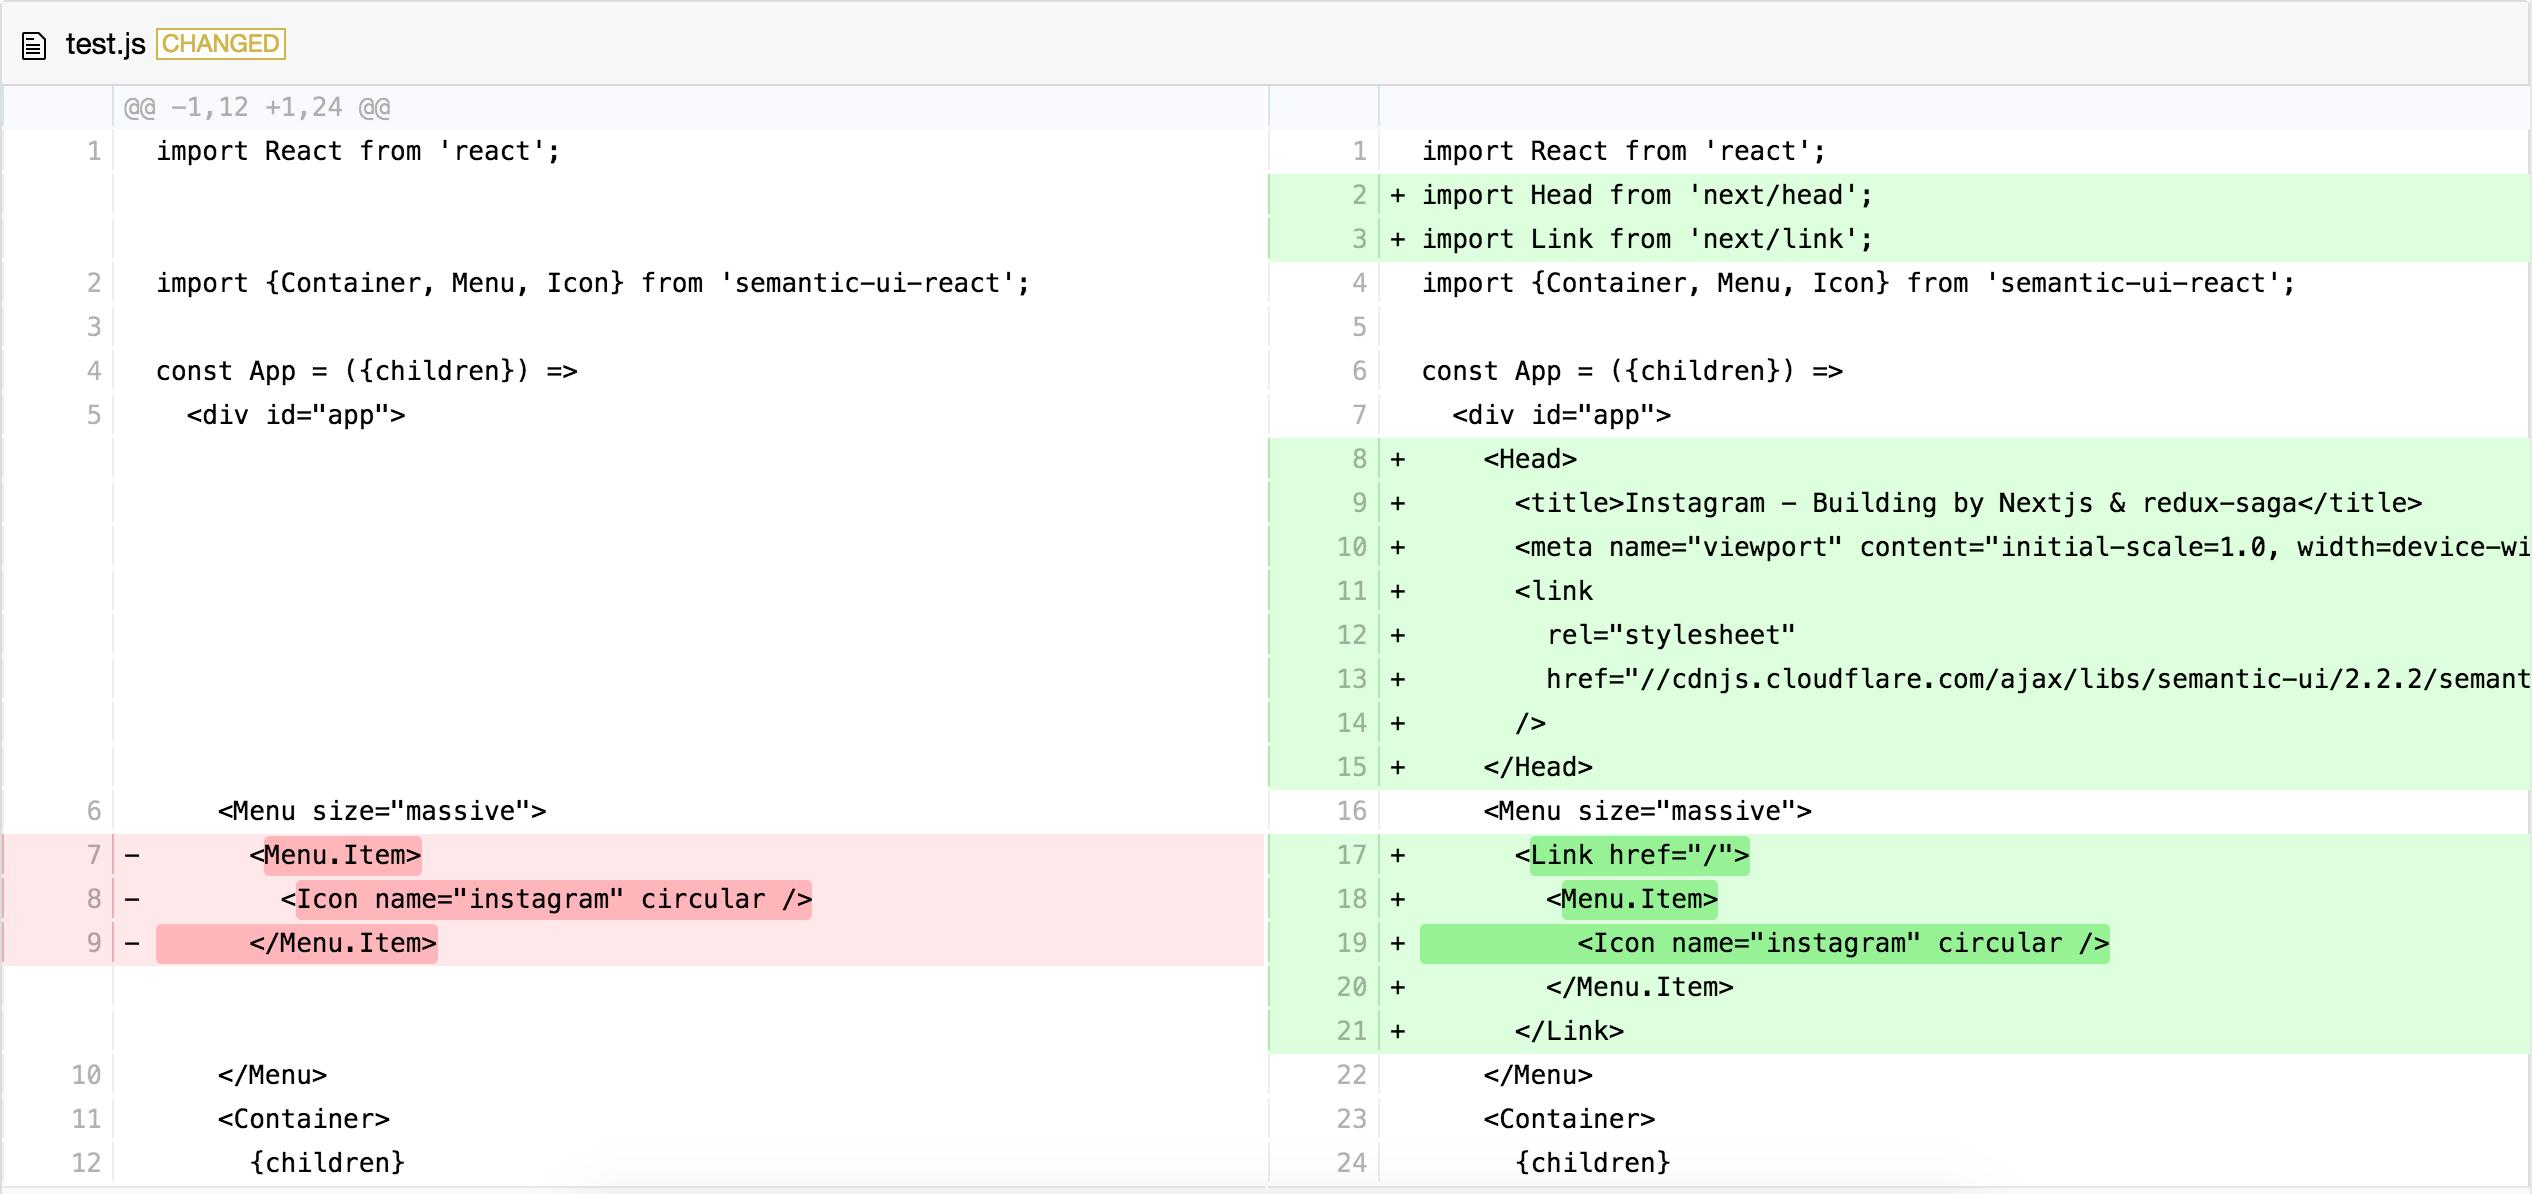 RunKit + npm: react-gh-like-diff